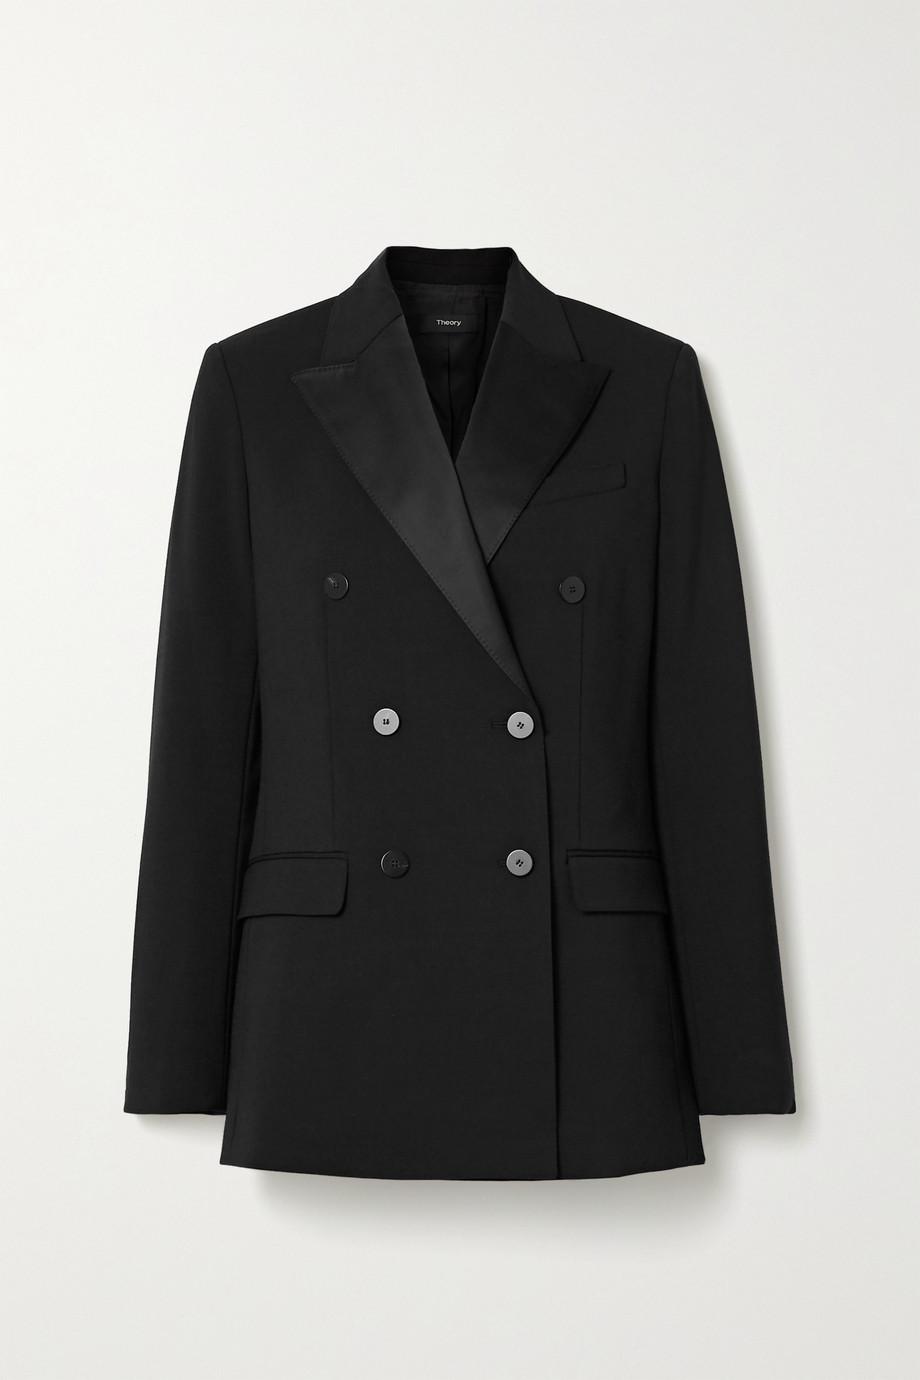 Theory Satin-trimmed cady blazer